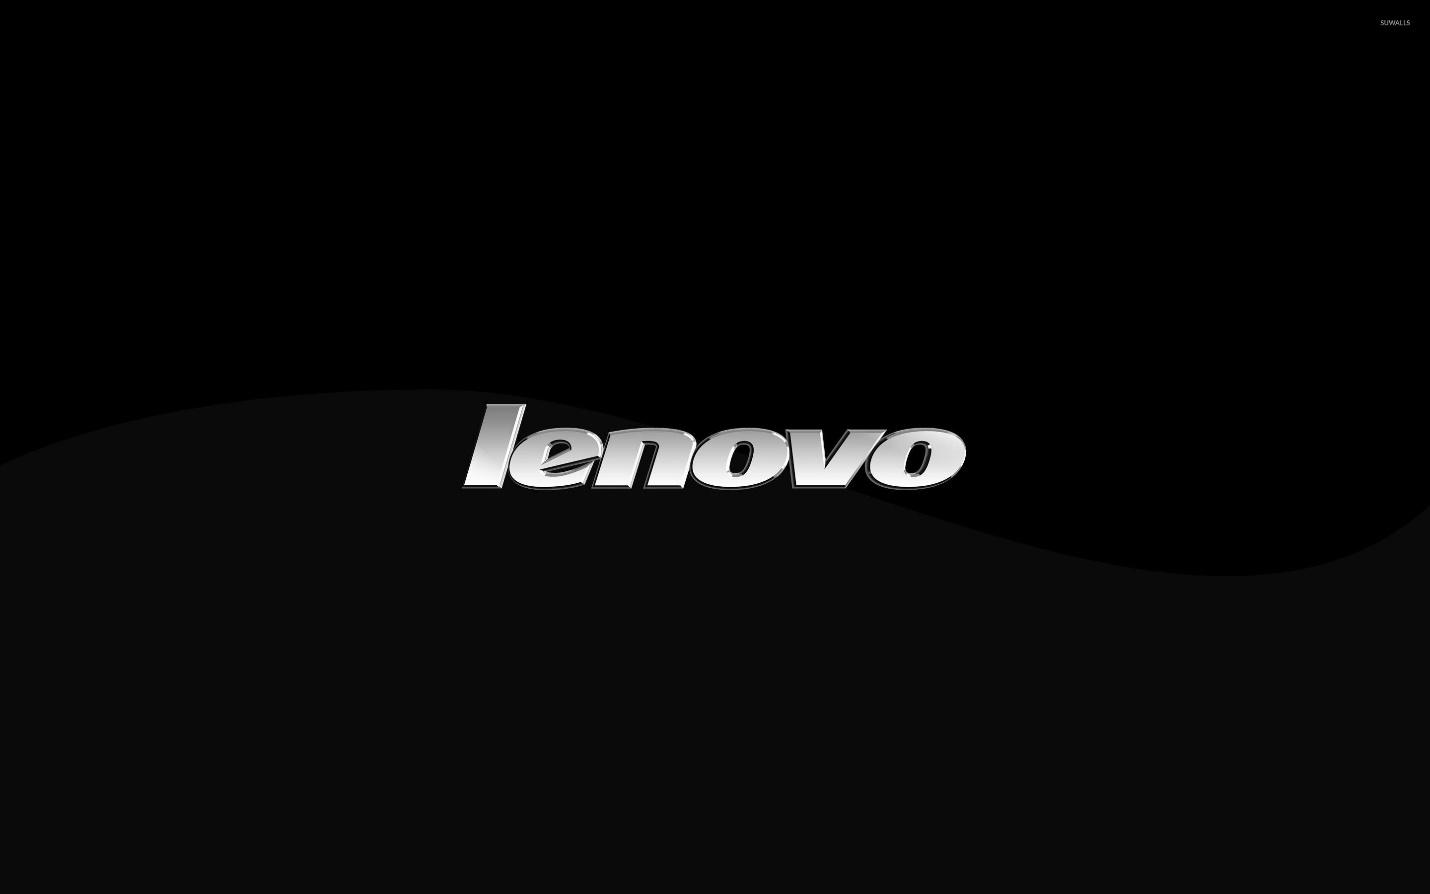 Lenovo Logo Wallpapers - Wallpaper Cave